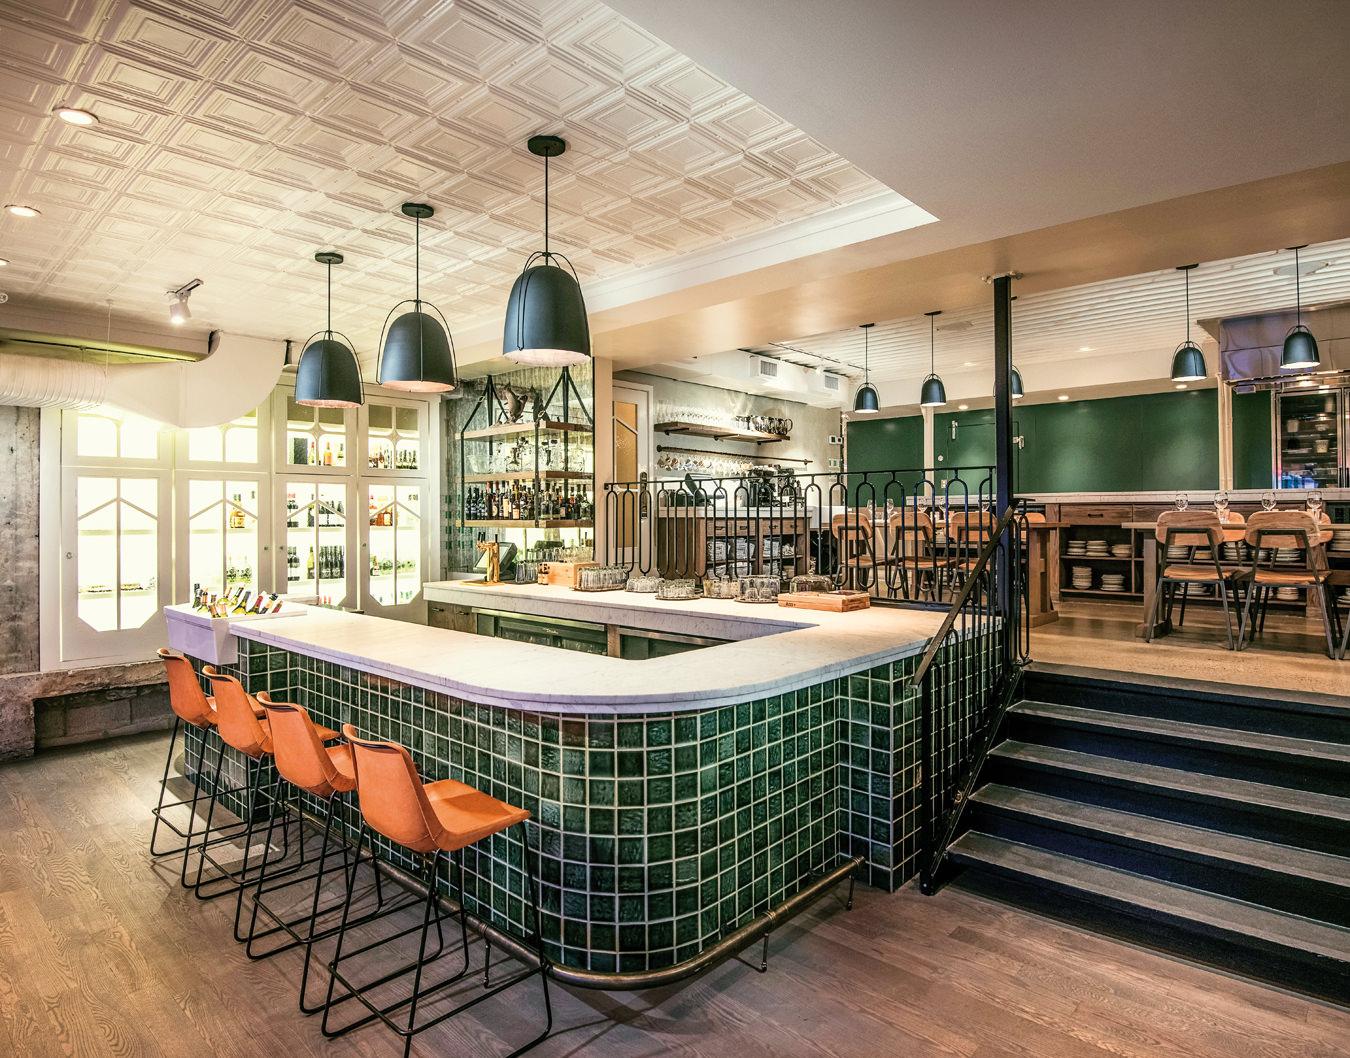 Retro bar design at the Pigeonhole restaurant in Calgary, Canada